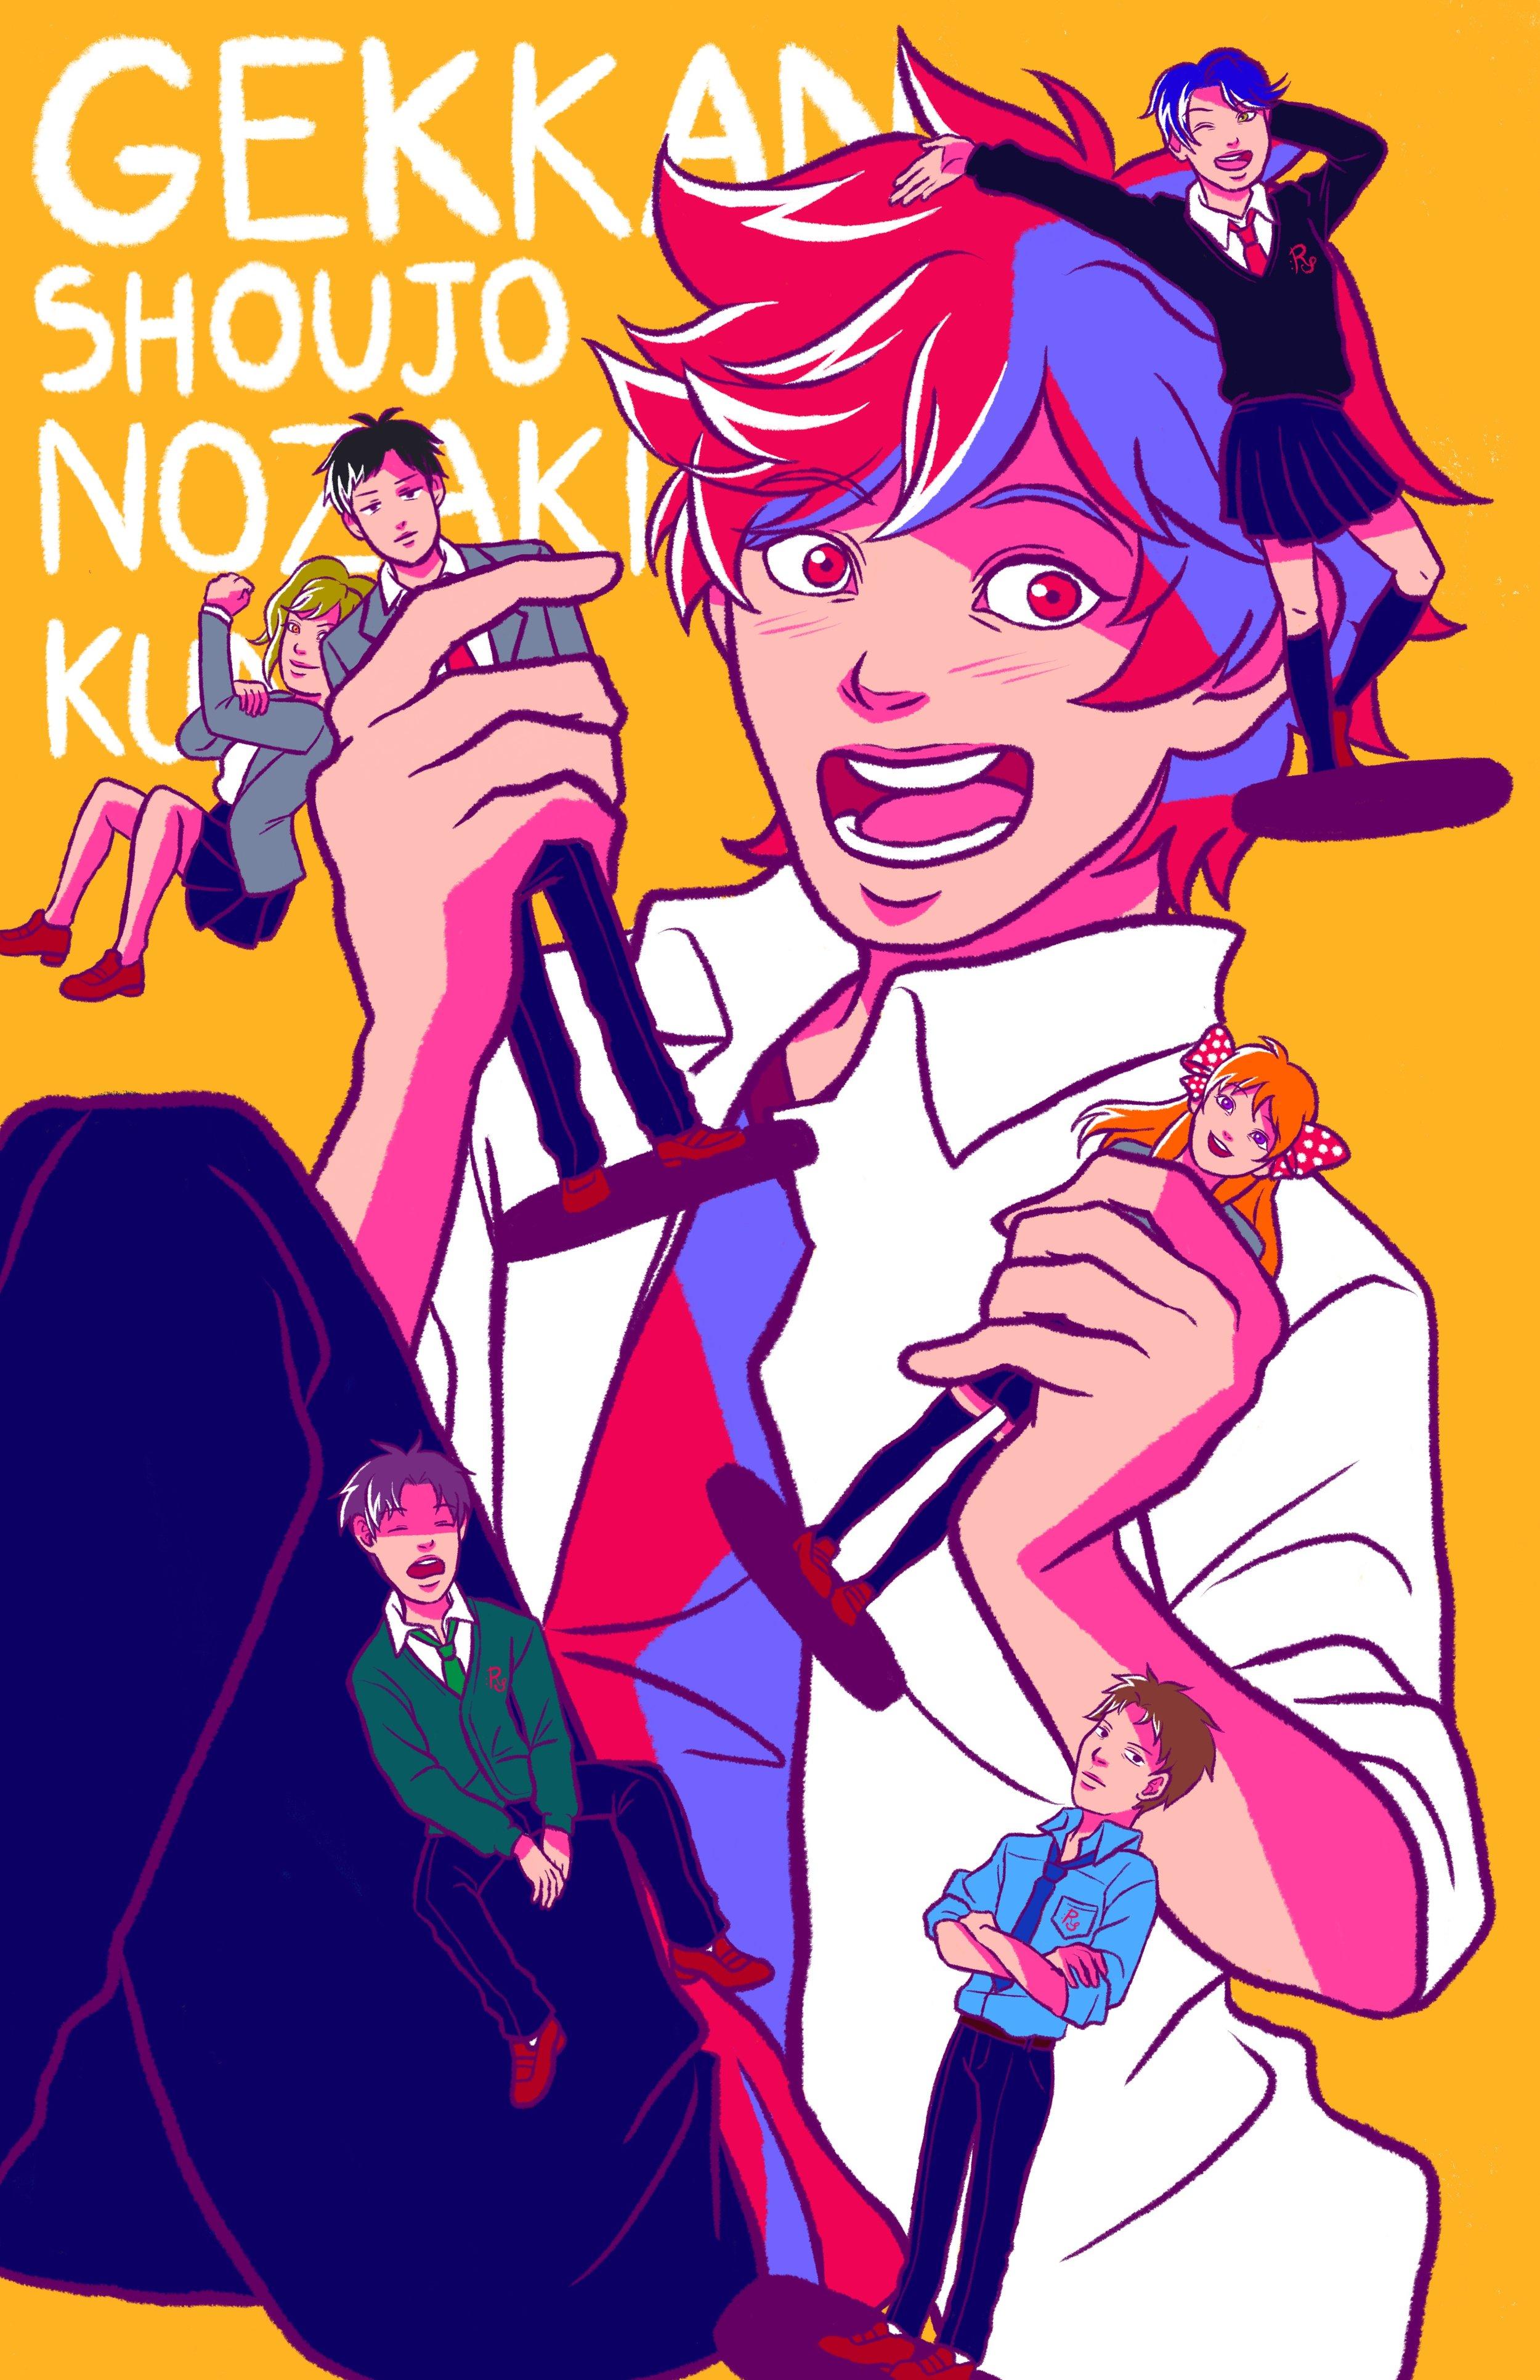 mikorin (gekkan shoujo nozaki kun) print